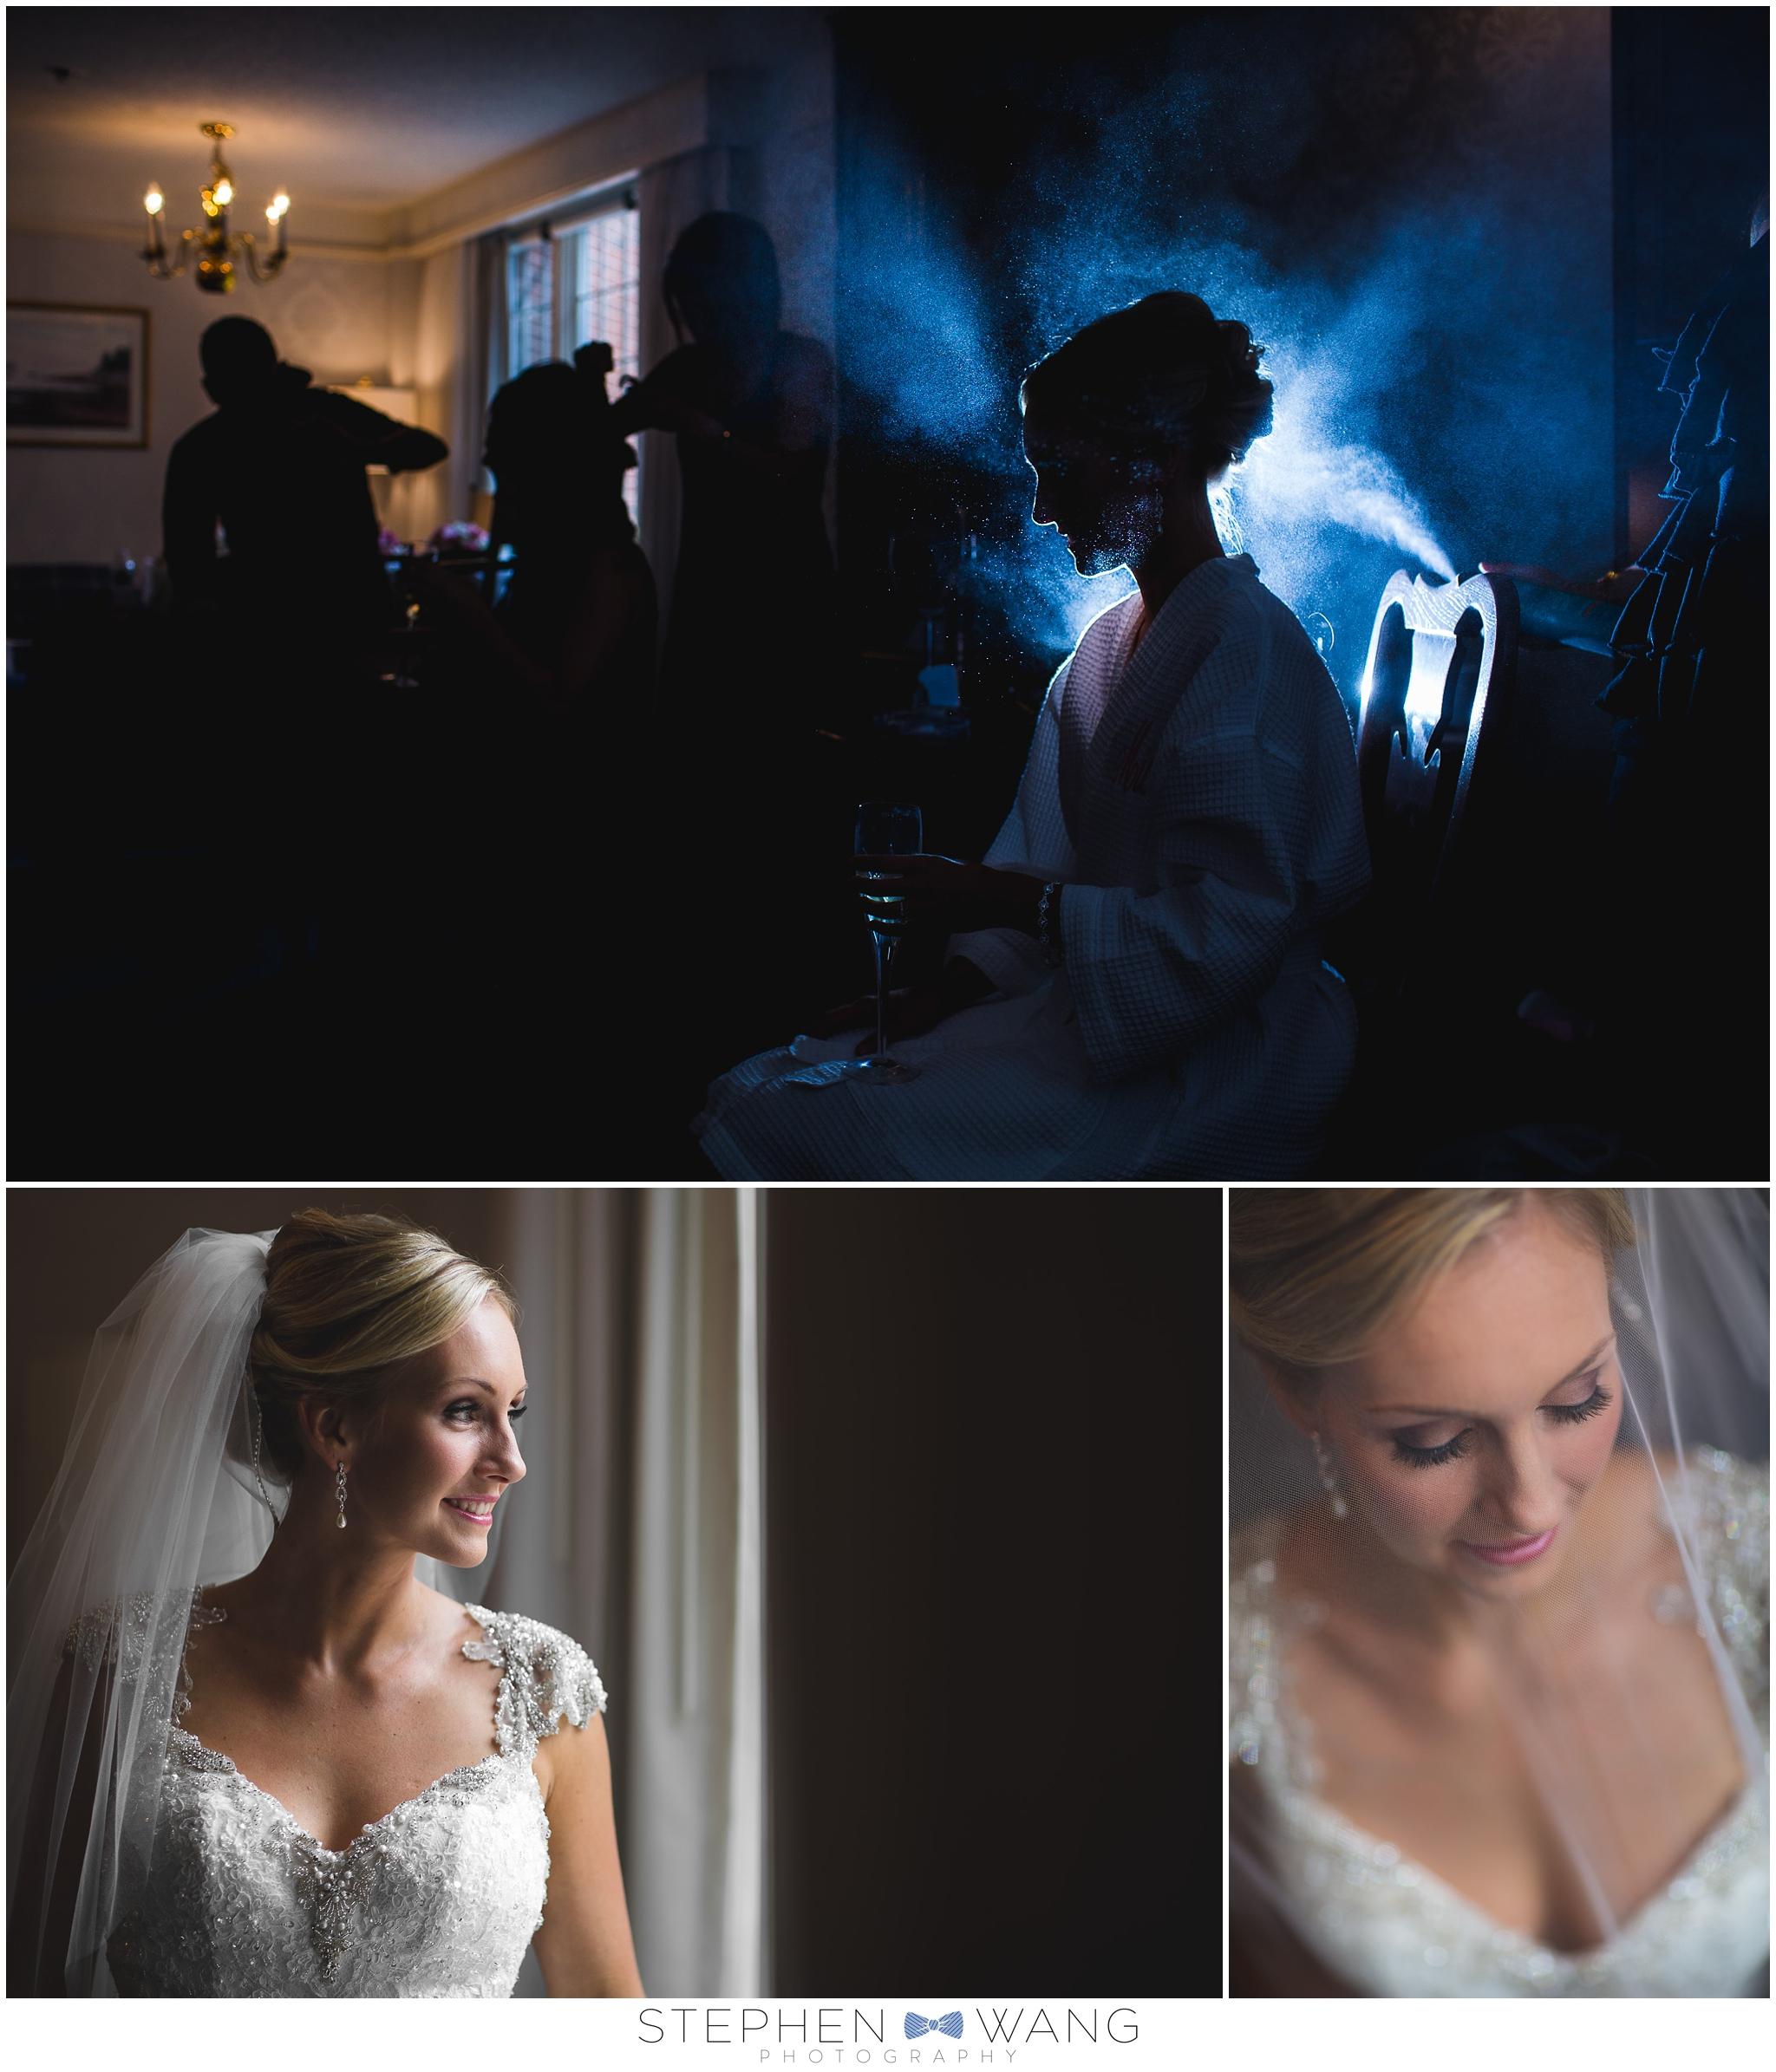 Stephen Wang Photography Wedding Photographer Connecticut CT-12-24_0001.jpg